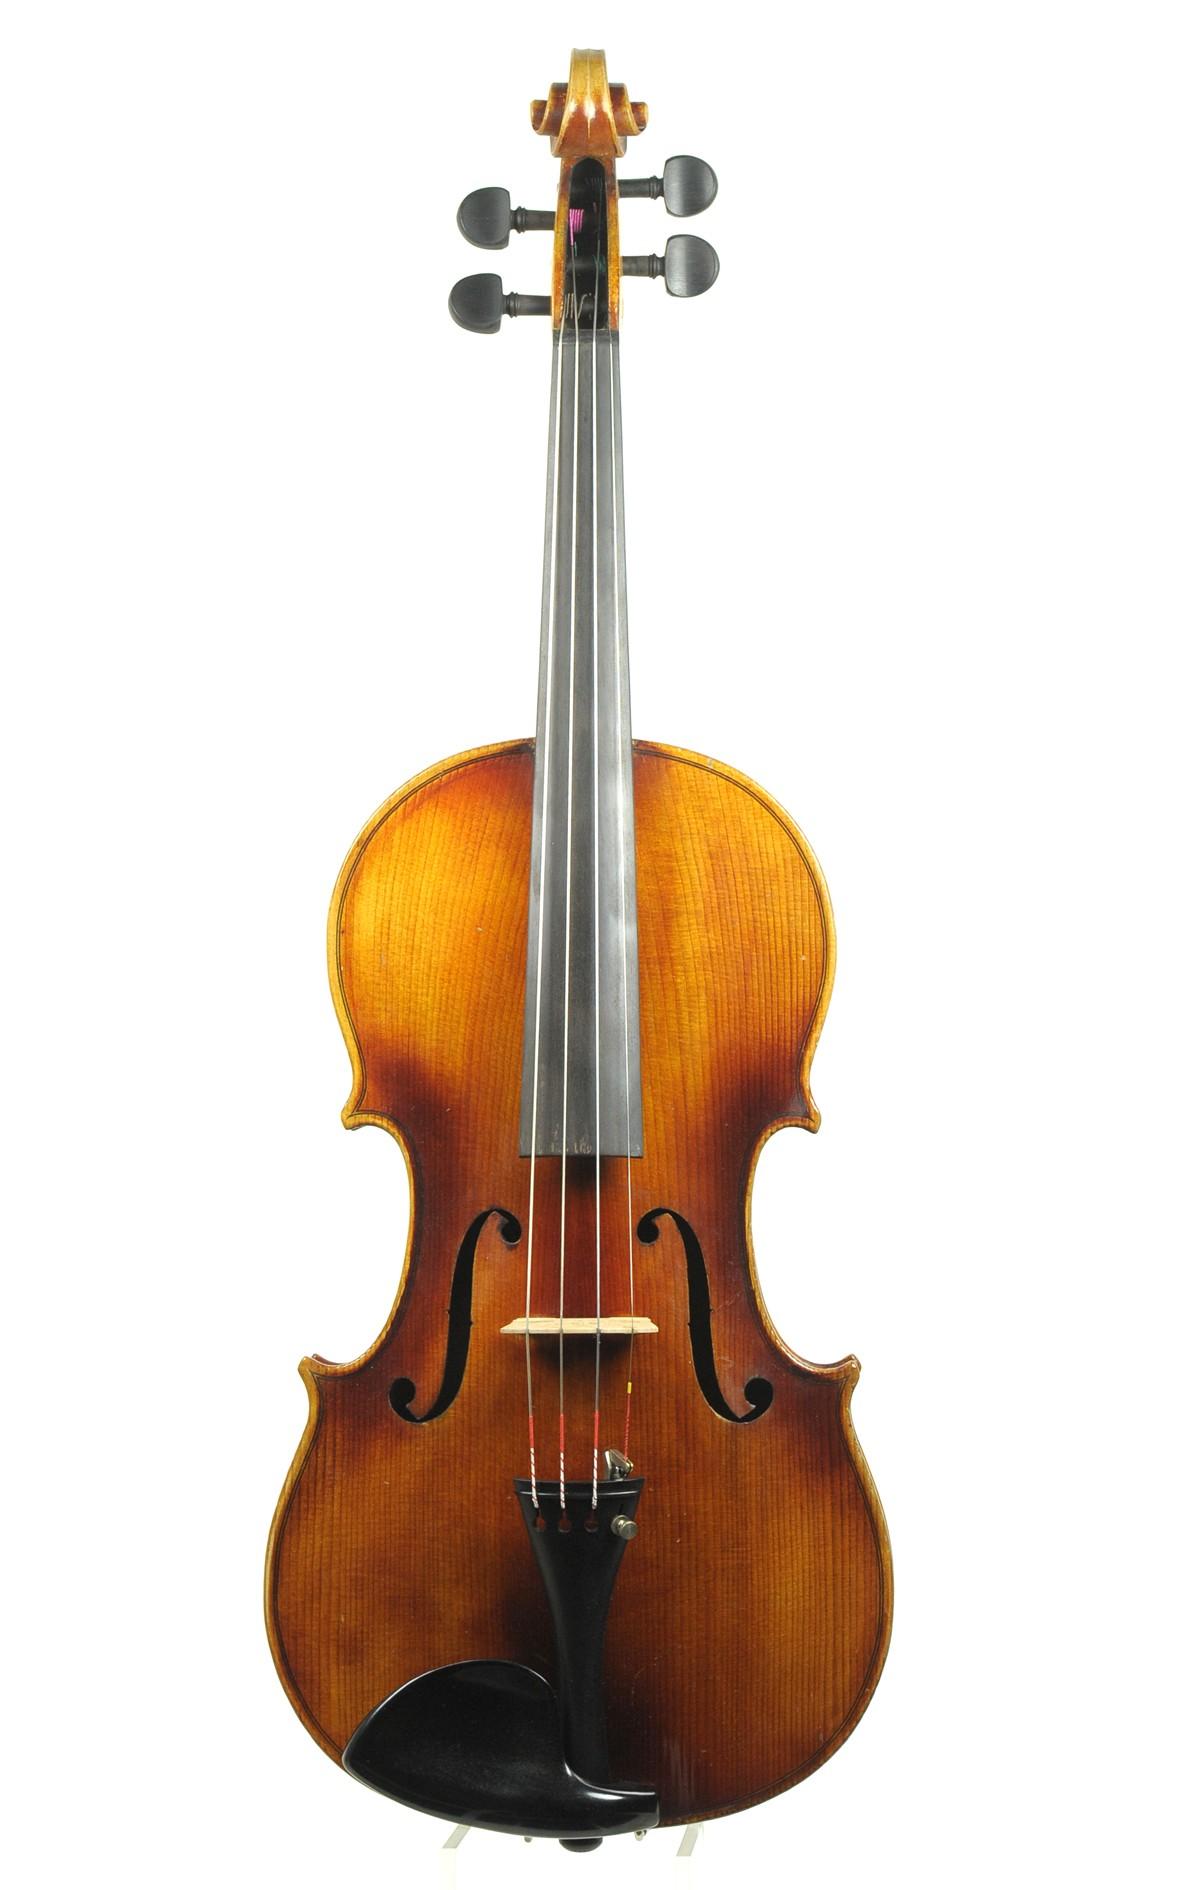 Modern German manufactured Bubenreuth violin - top